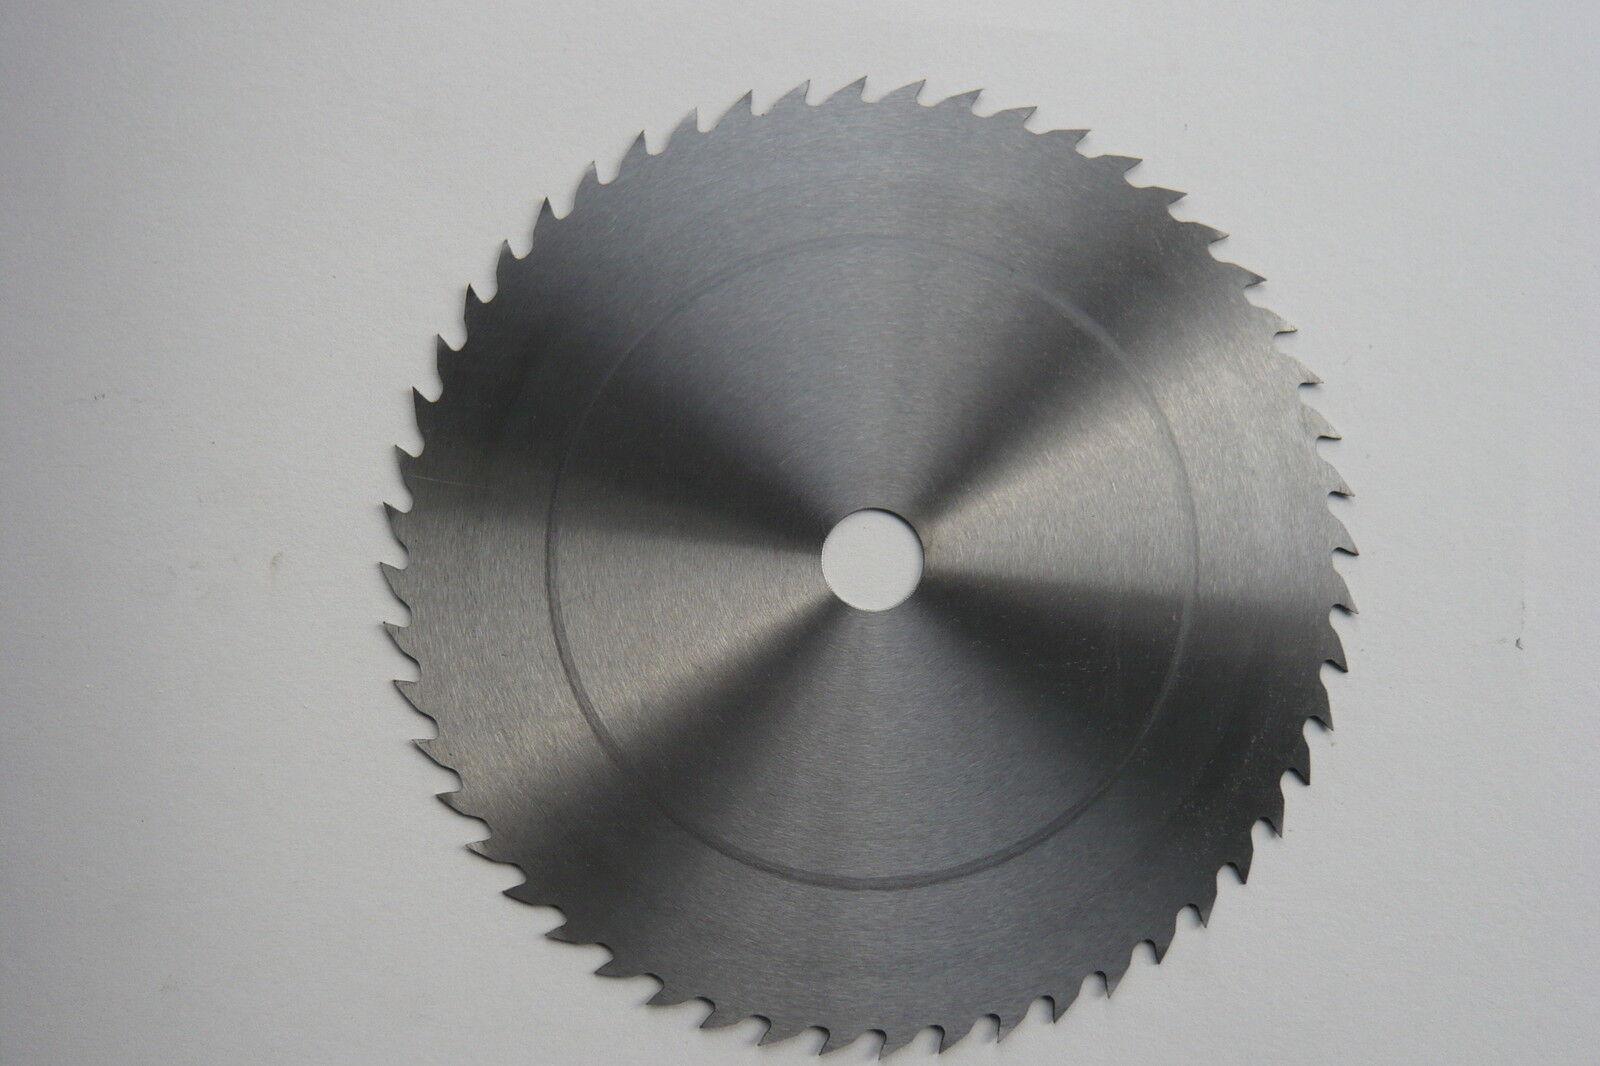 Kreissägenblatt C75 Stahl, Chrom-Vanadium, Grobzahn (Wolfszahn)